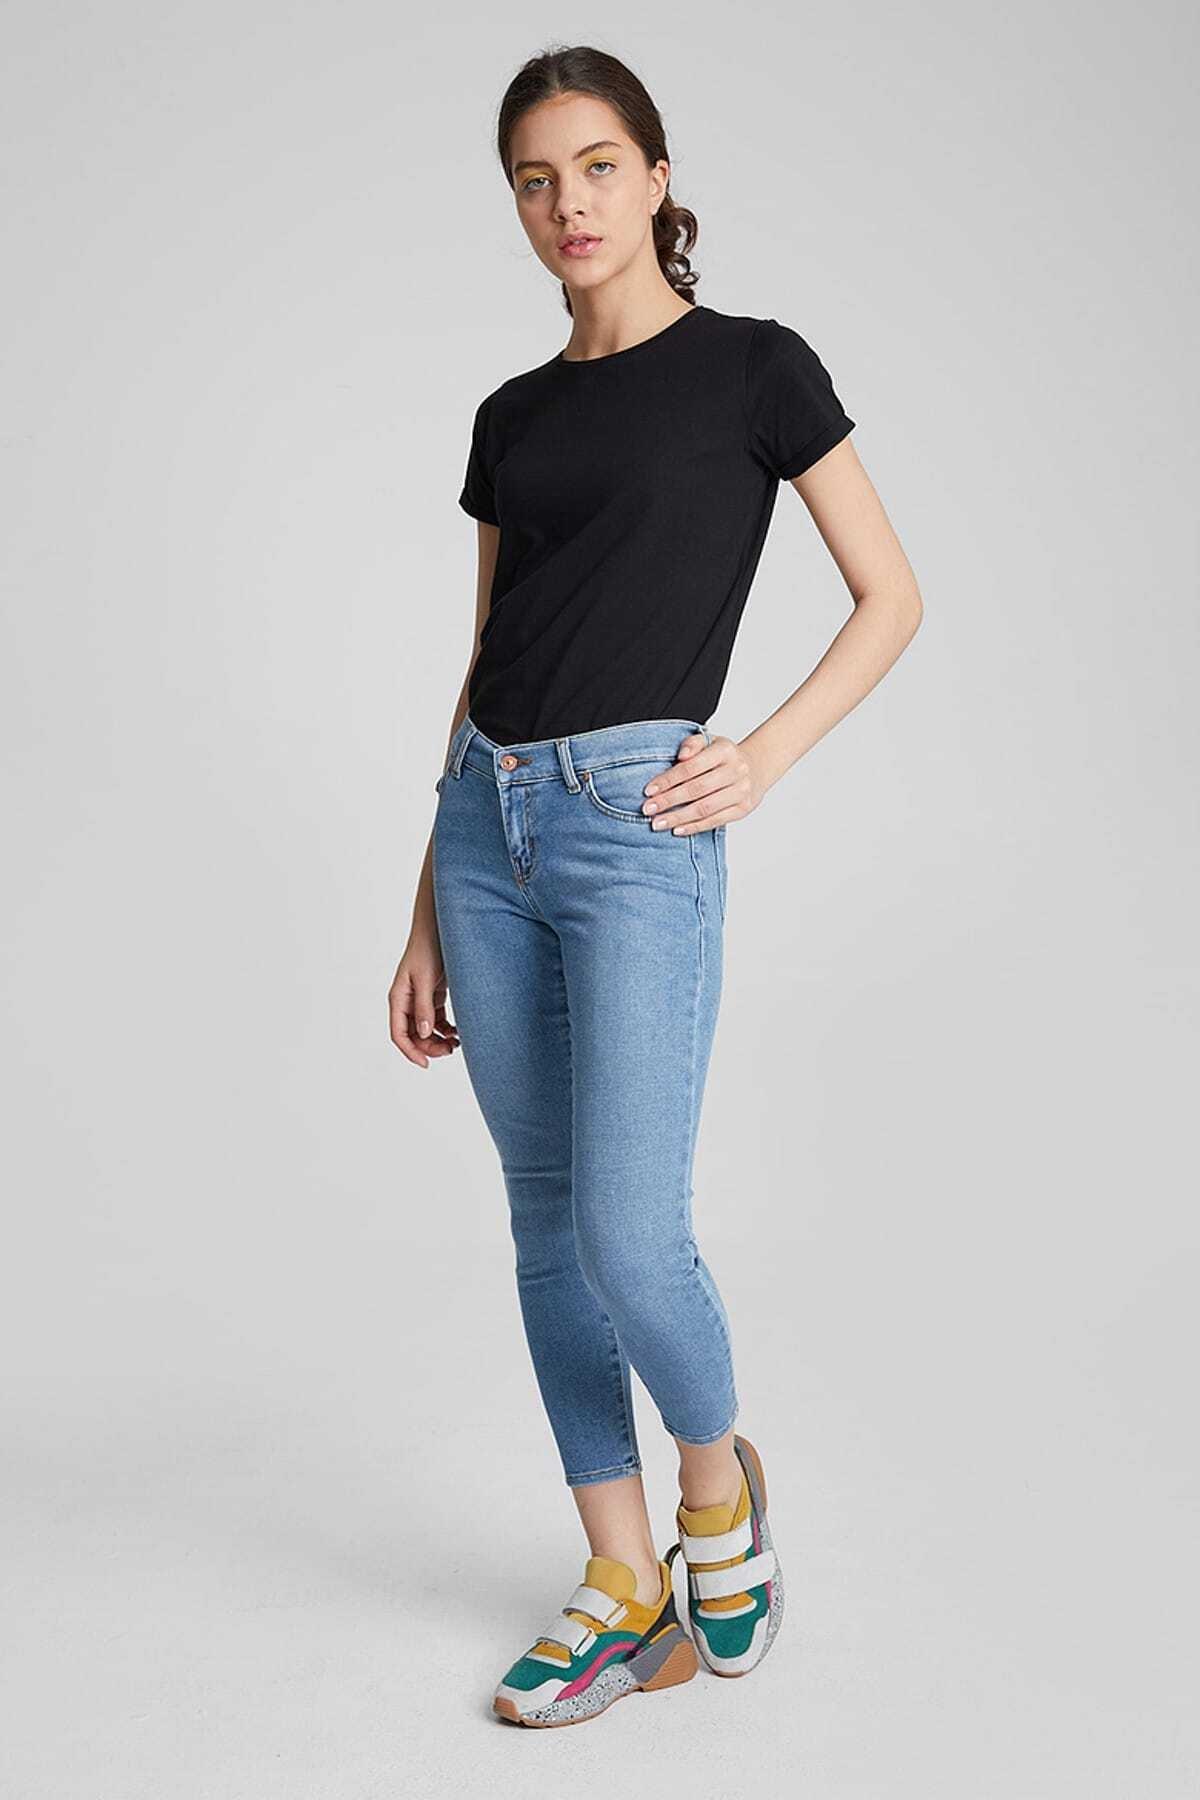 Ltb Kadın Lonıa Super Skinny Jean Pantolon-01009510321458452041 1